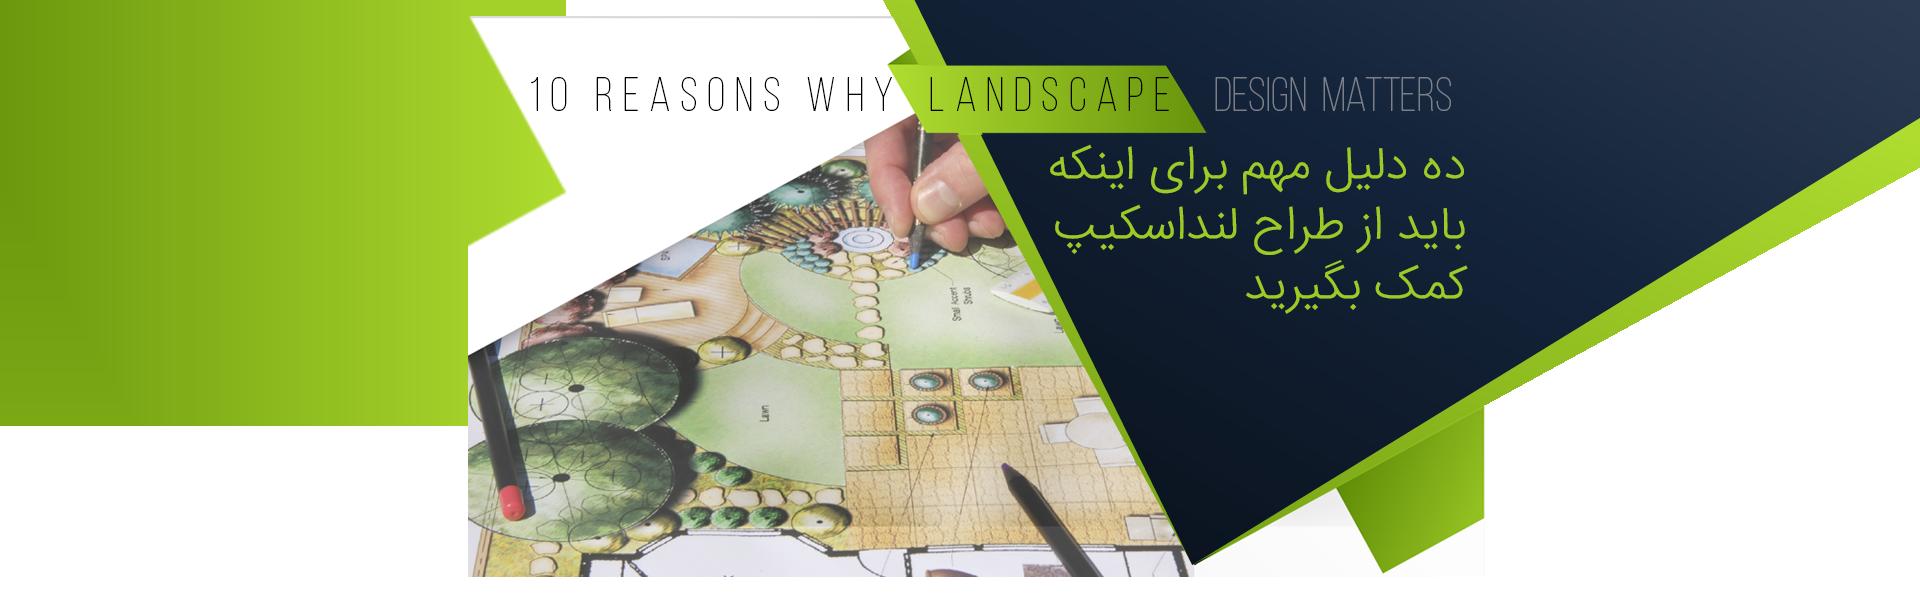 decorasion landscape tarah9 - ۱۰ دلیل مهم برای استفاده از طراح لنداسکیپ